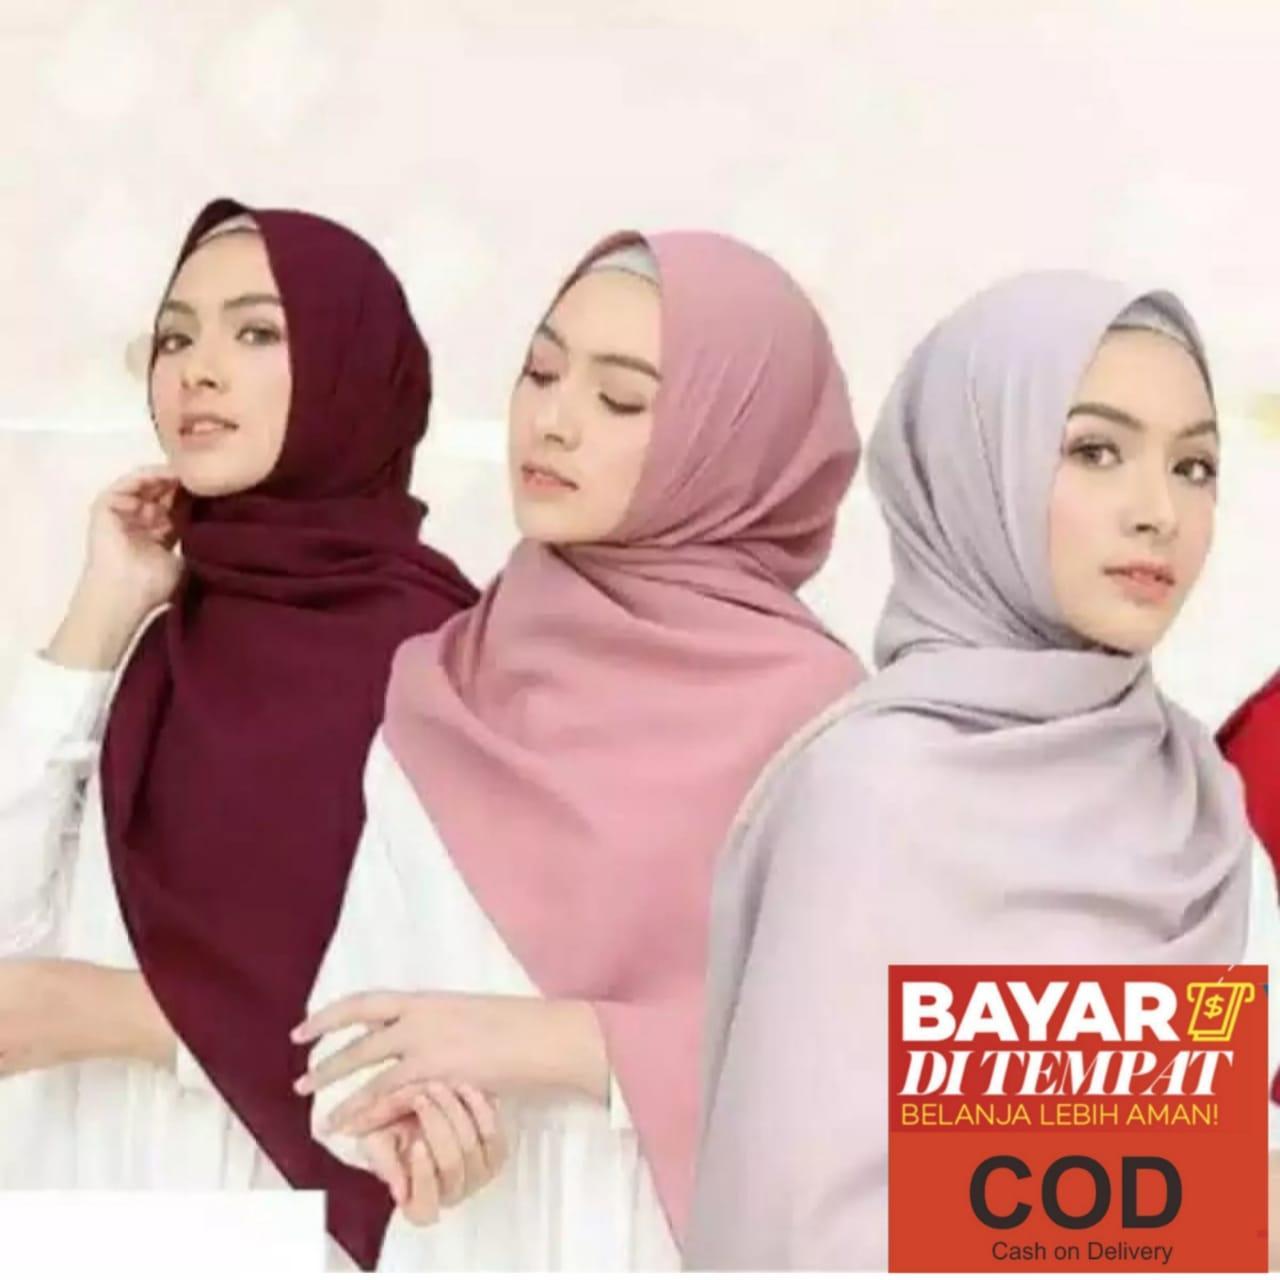 Jilbab Pashmina SABYAN DIAMOND Italiano Kerudung terbaru murah COD gerai ayyub